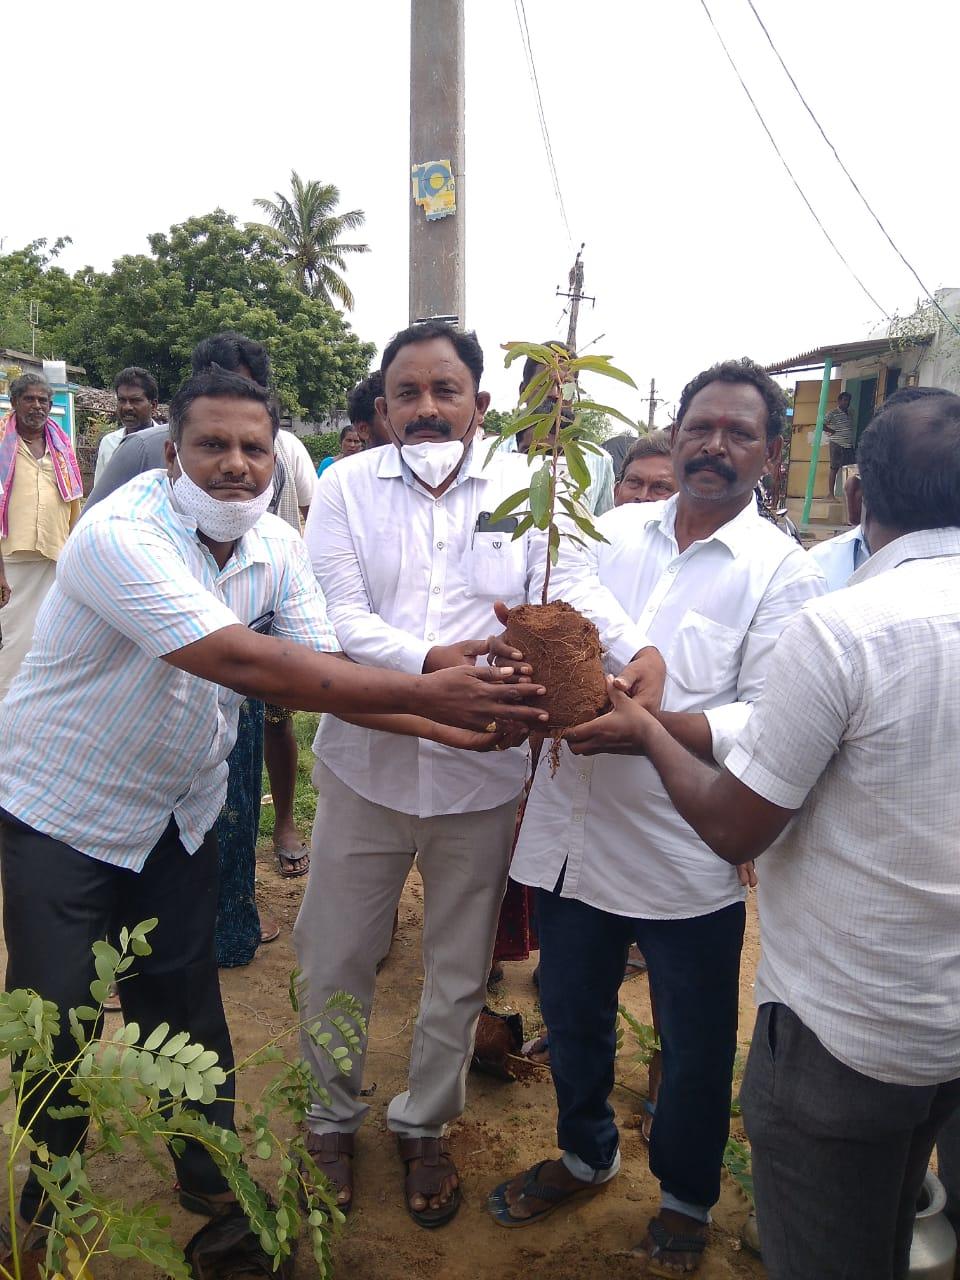 Uppalapati Siva Rama Raju   Village President   Senior Leader   Party Activist   Social Activist   Congress   YSRCP   Ananthavaram   Tangutur   Kondapi   Prakasam   Andhra Pradesh   theLeadersPage